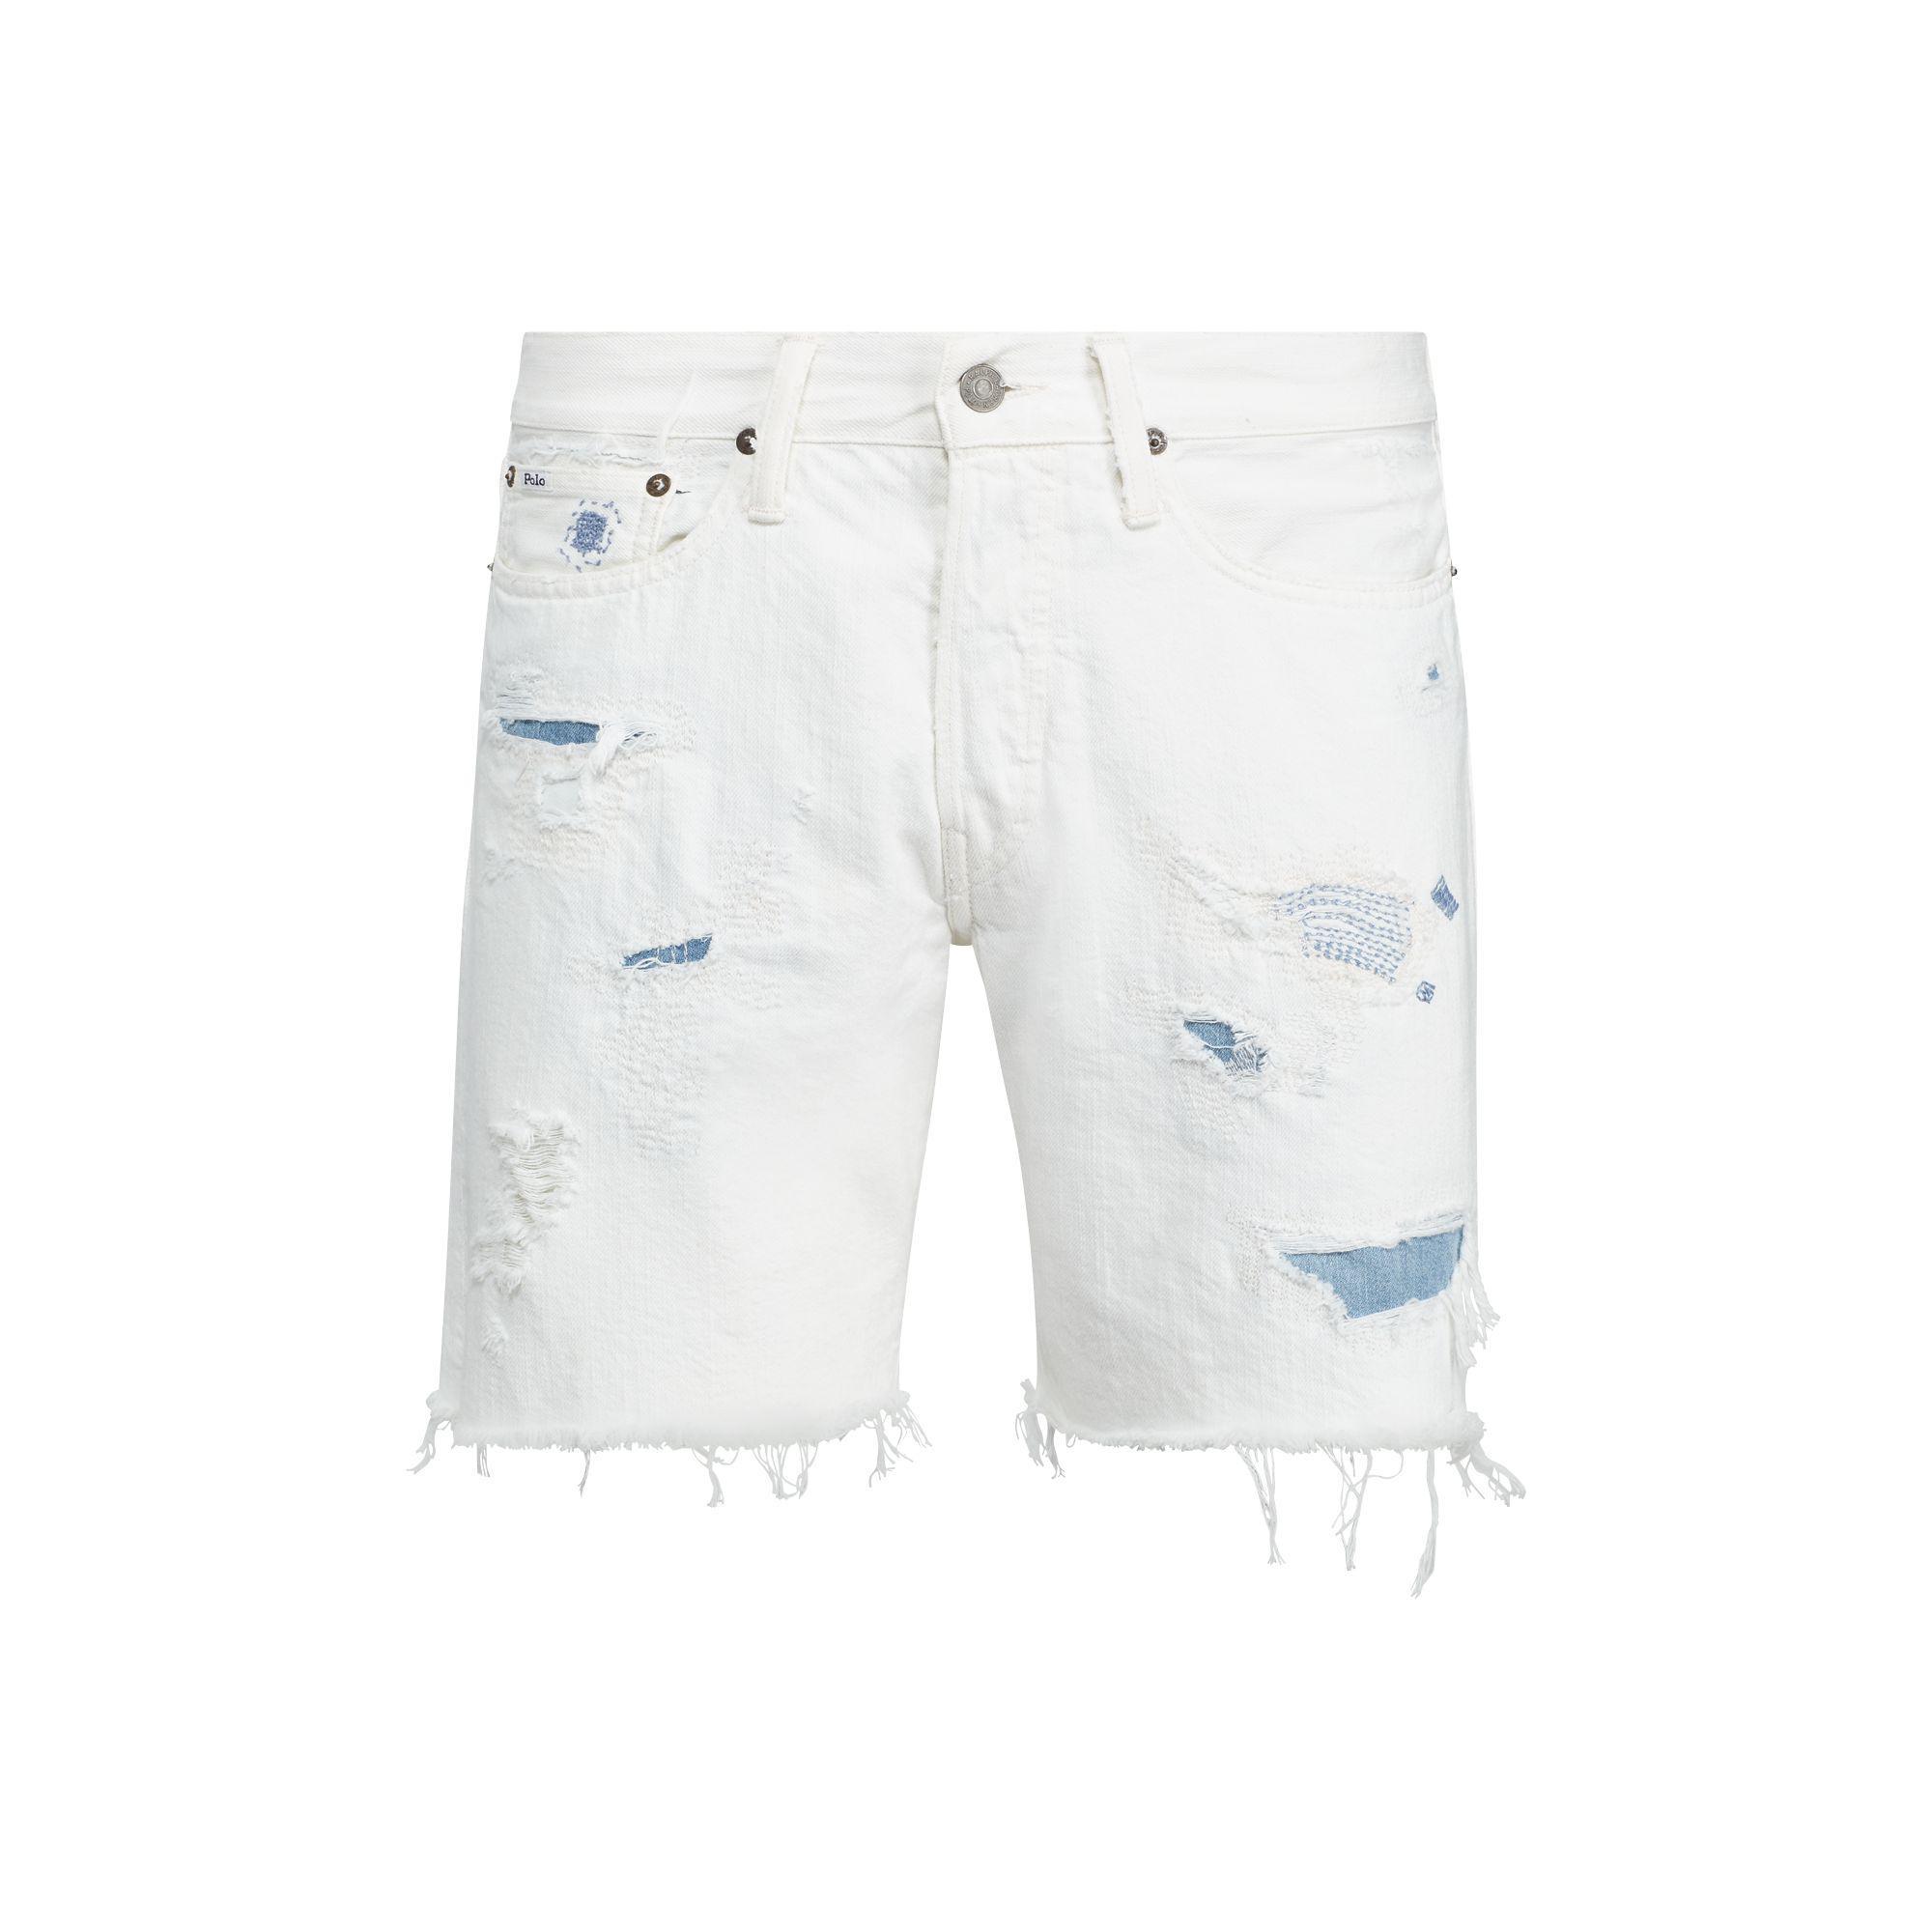 d0a73446f Polo Ralph Lauren Sullivan Slim Cutoff Short in White for Men - Lyst